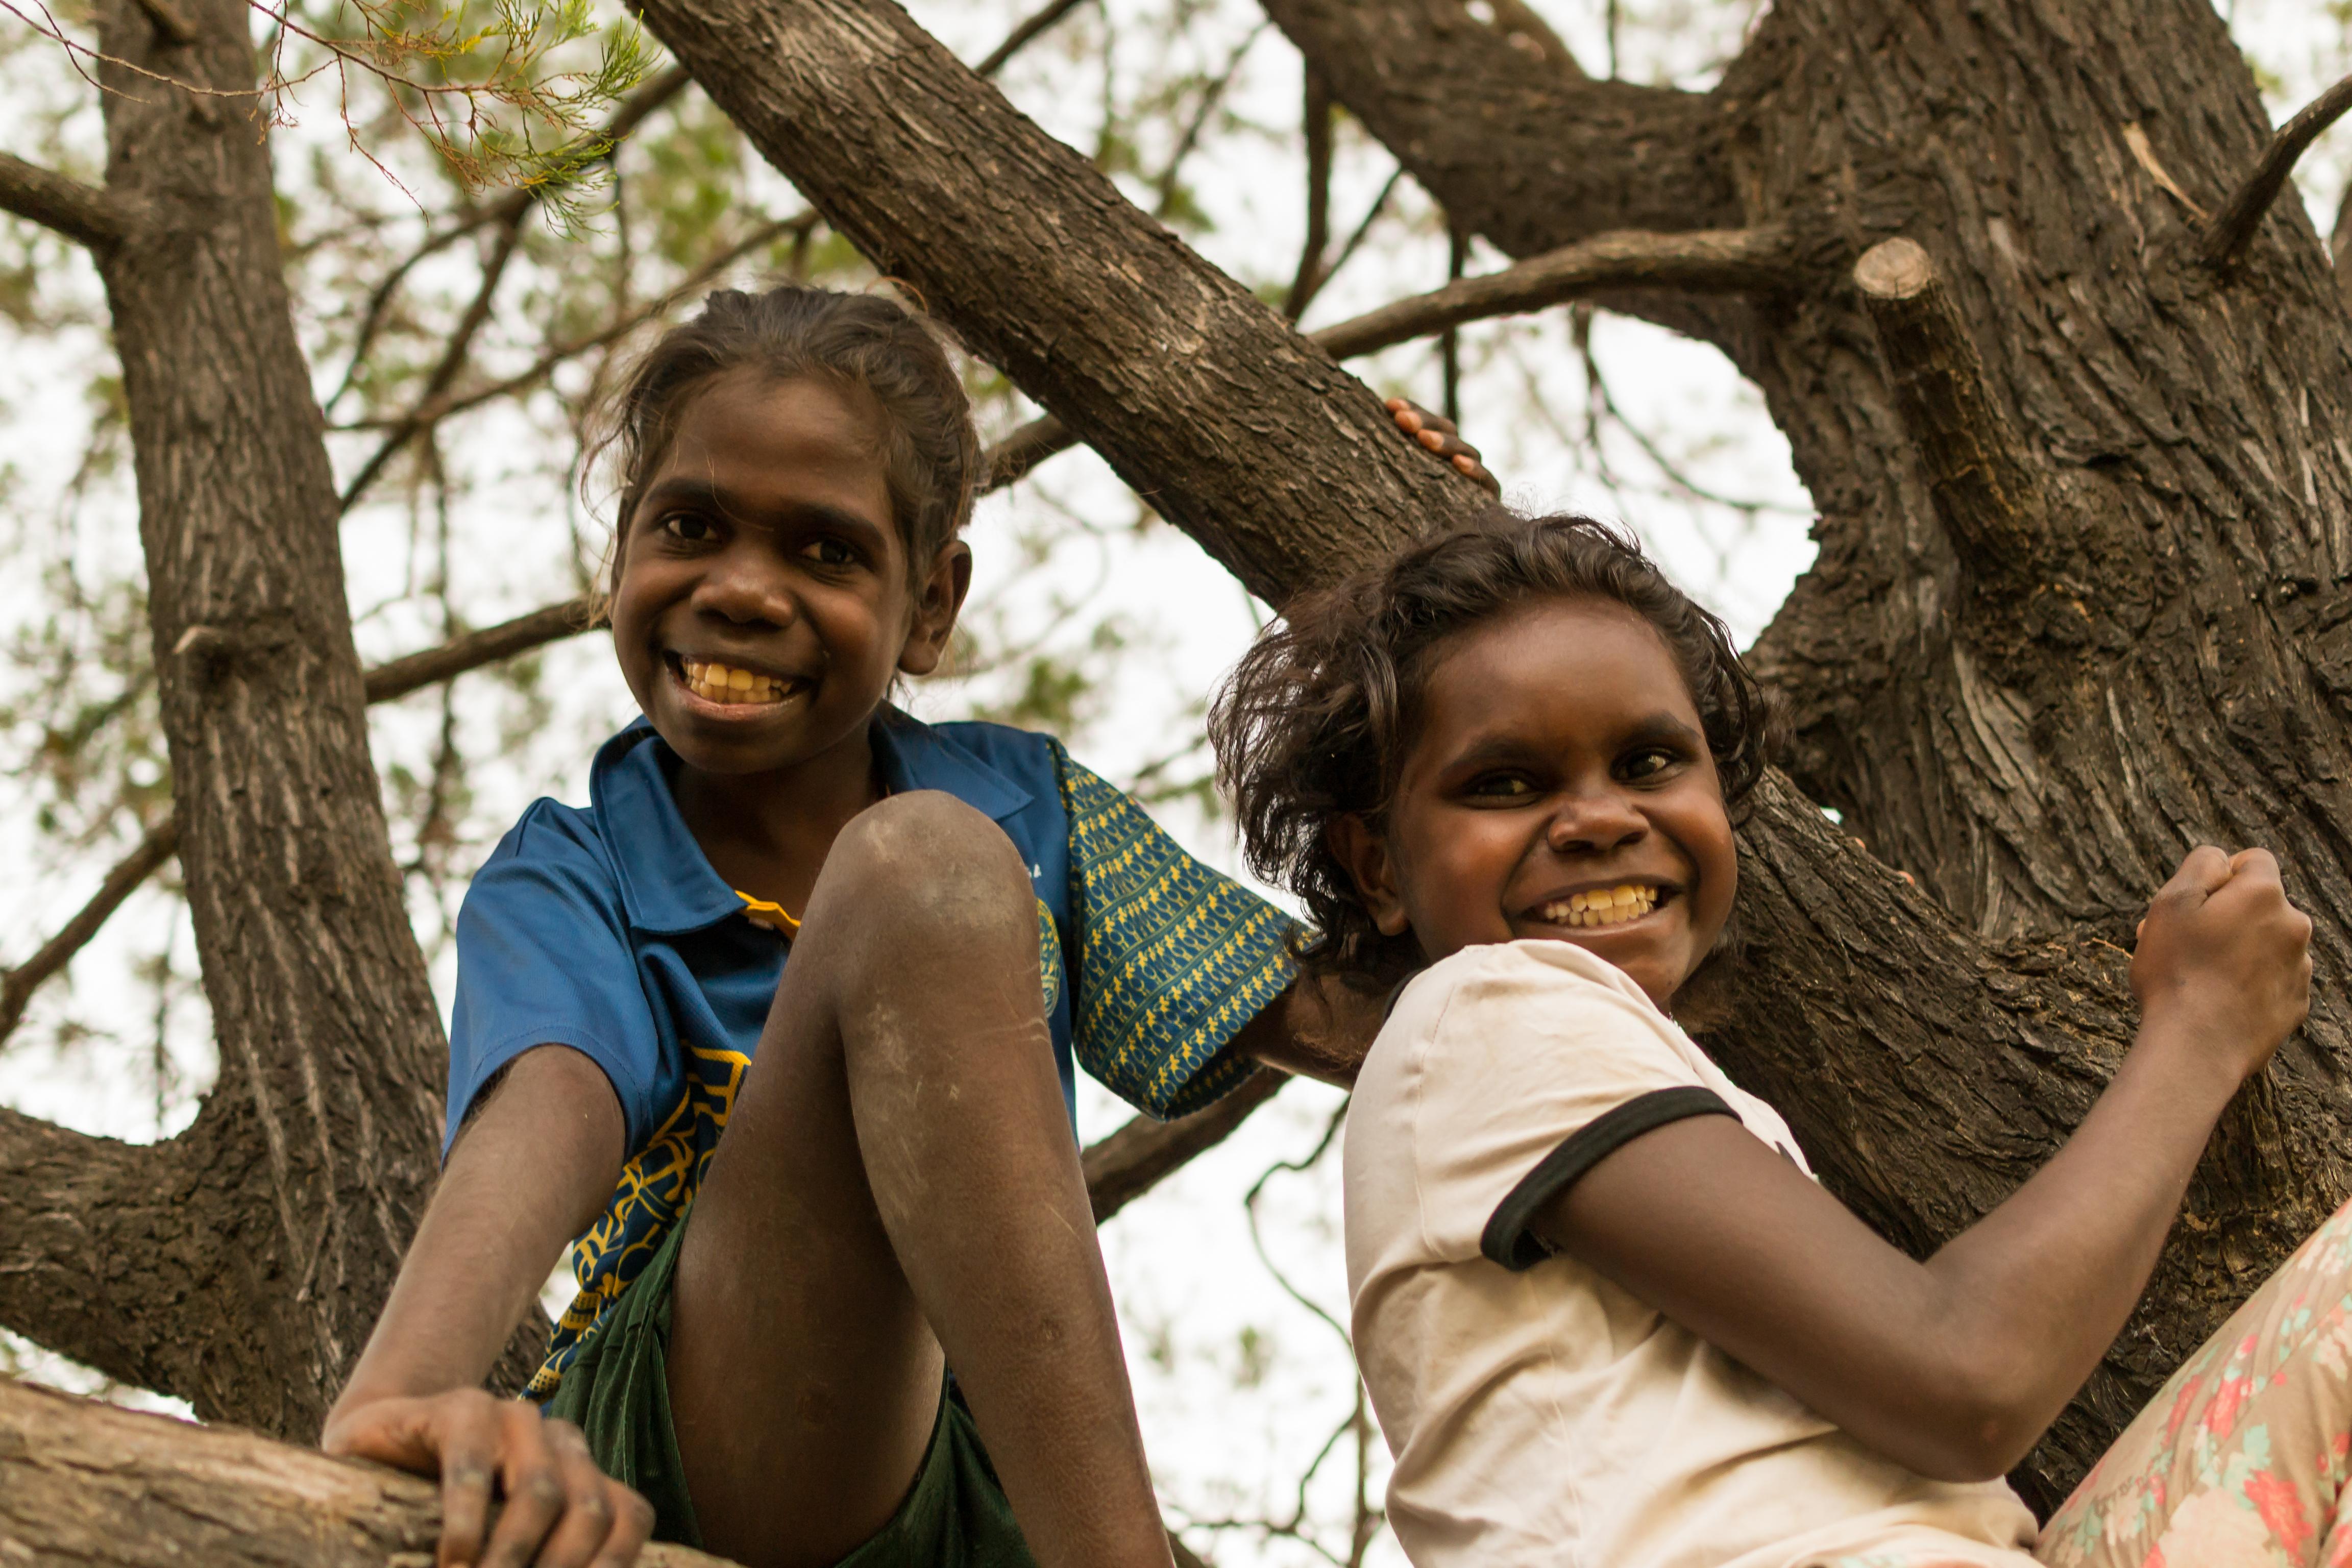 Two girls play in the tree before Kids Club, Barunga